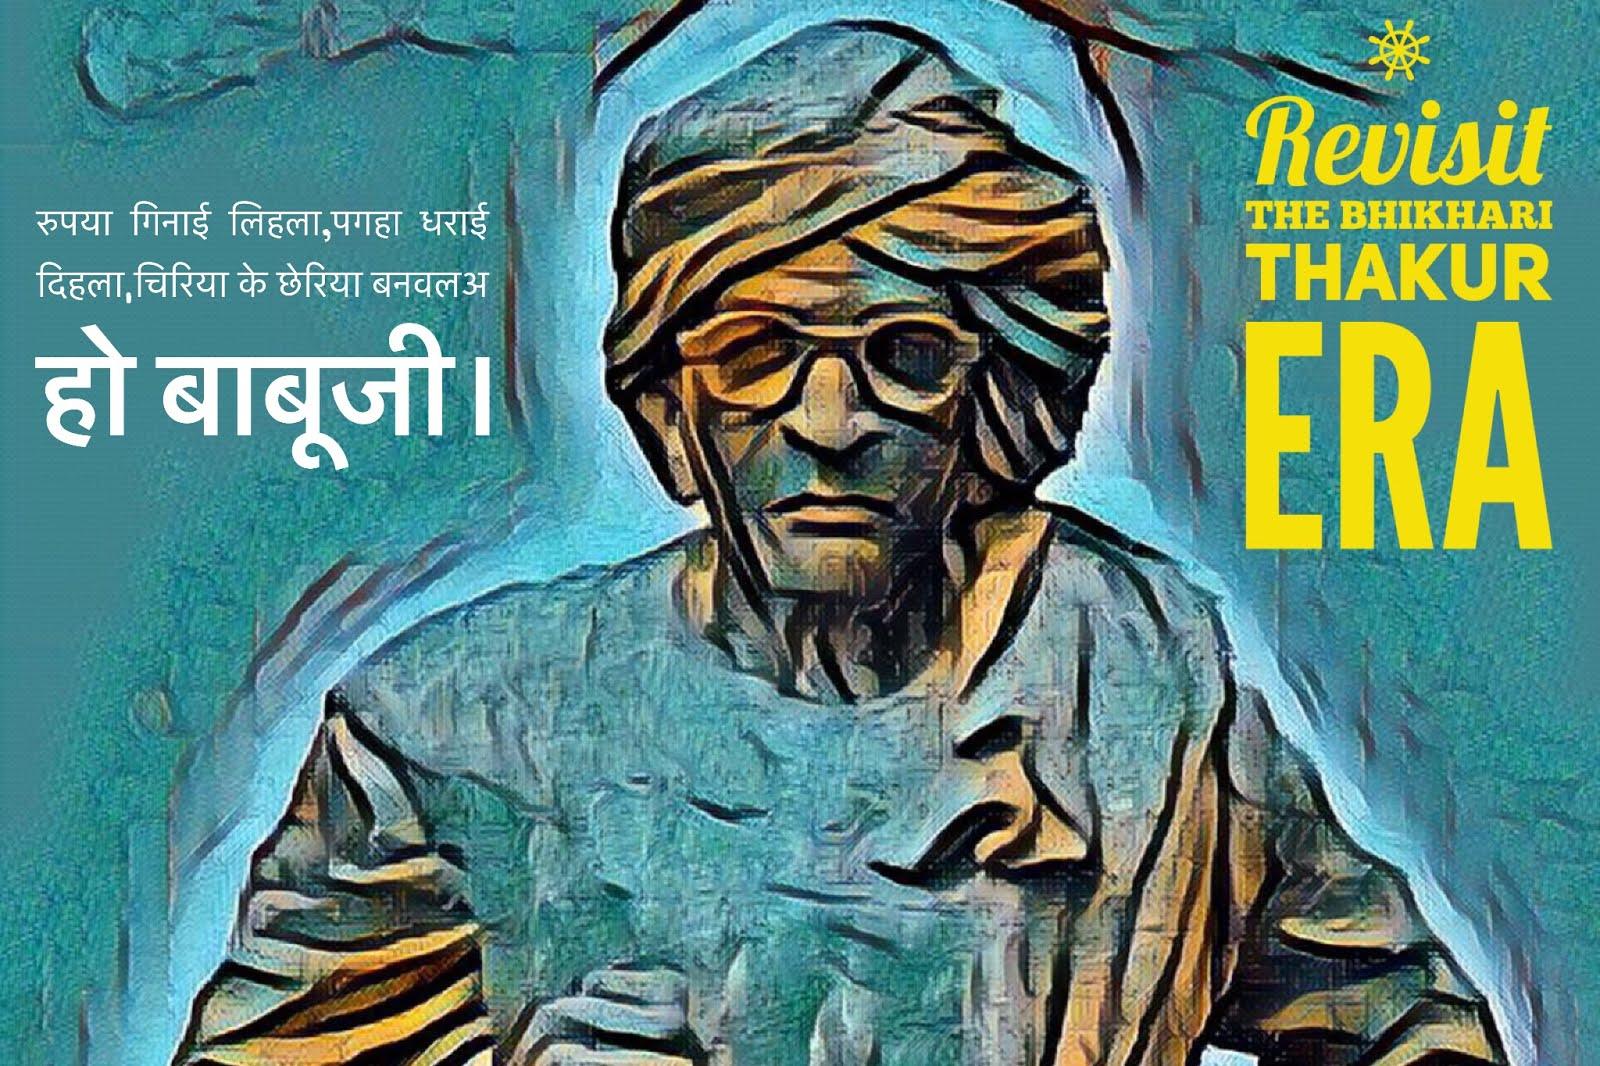 #BhikhariThakurQuotes